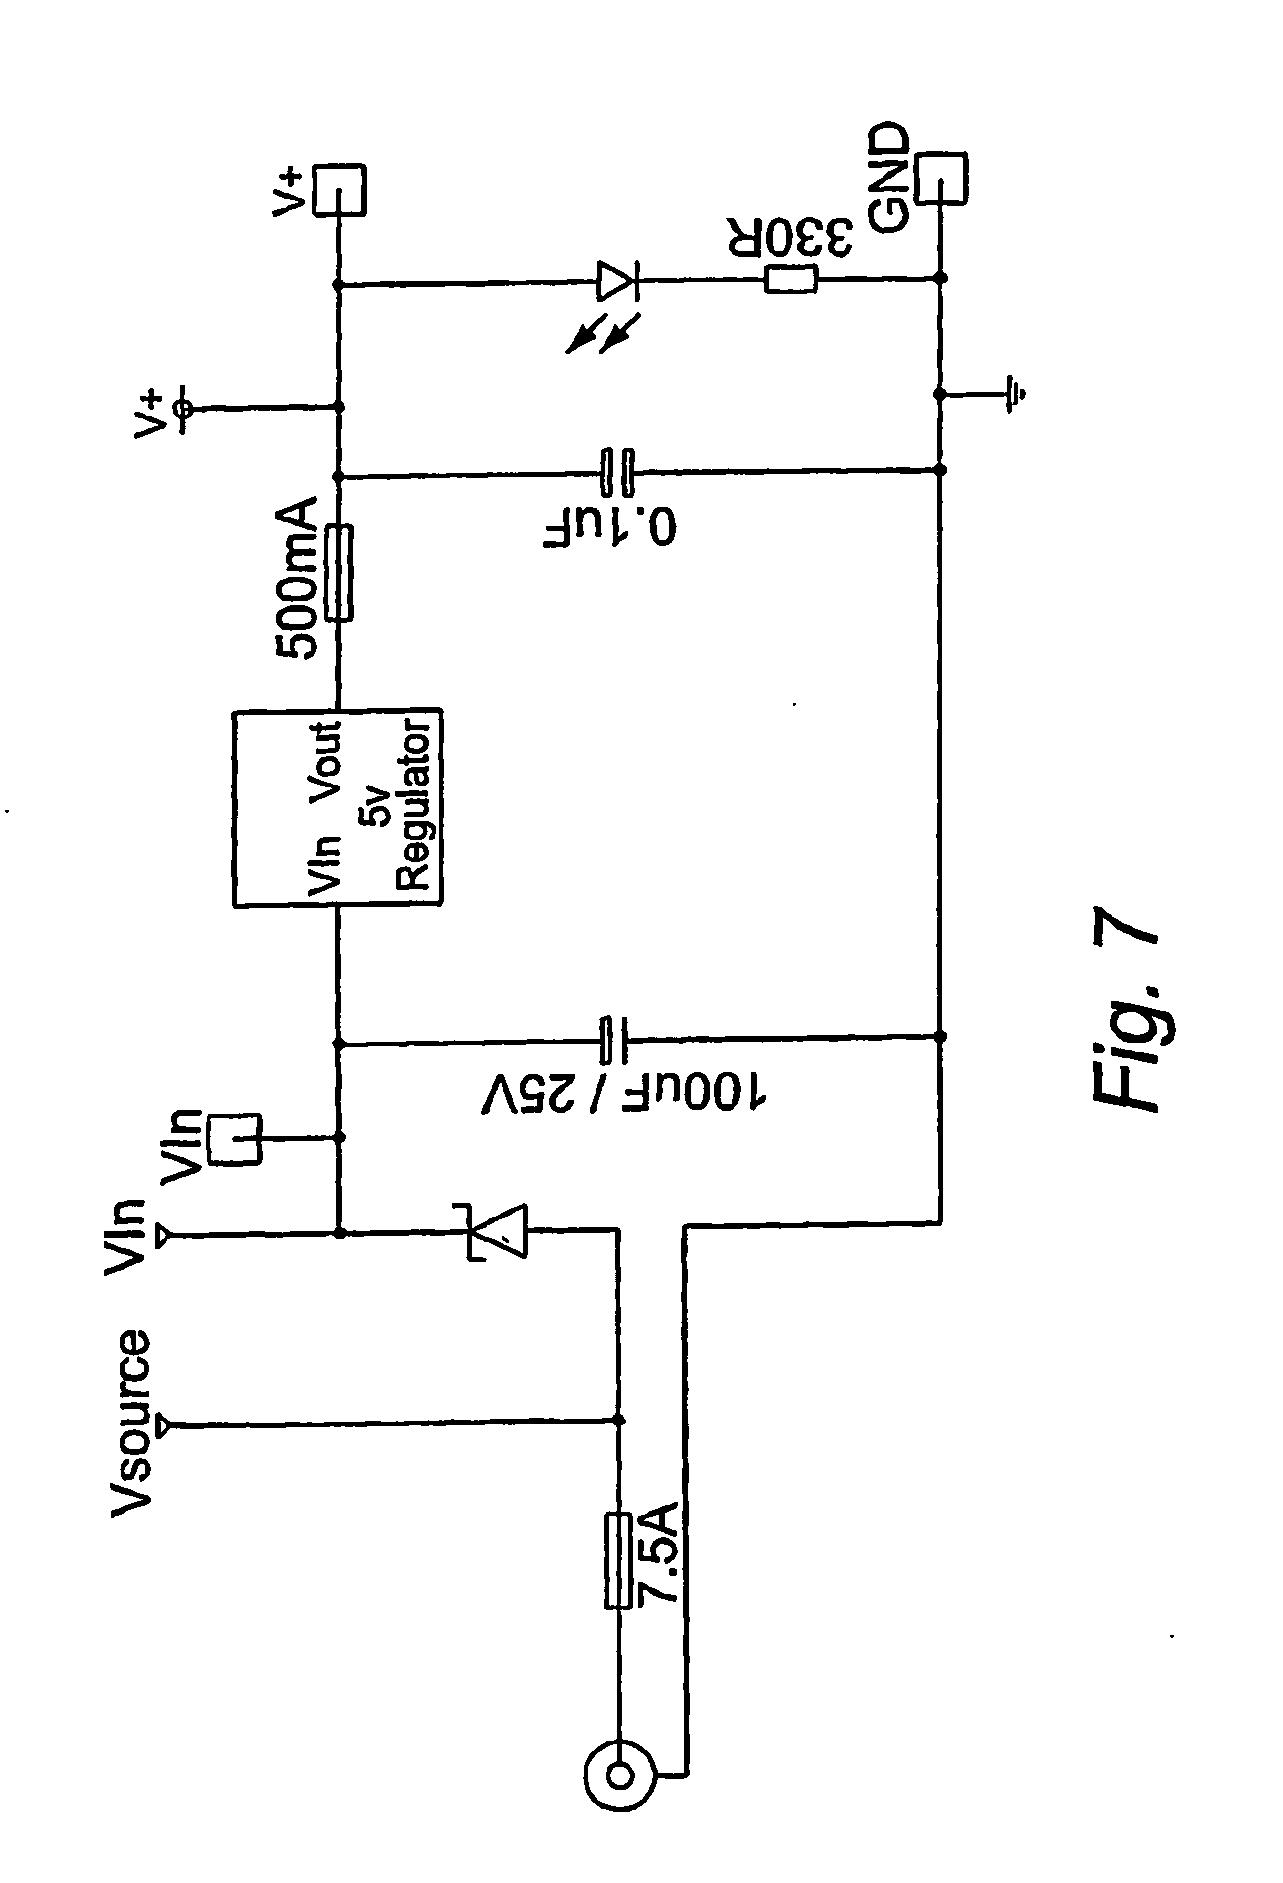 1986 chevy diesel alternator wiring diagram powakaddy wiring diagram patent us20100213889 - method of recharging a caddy cart ...